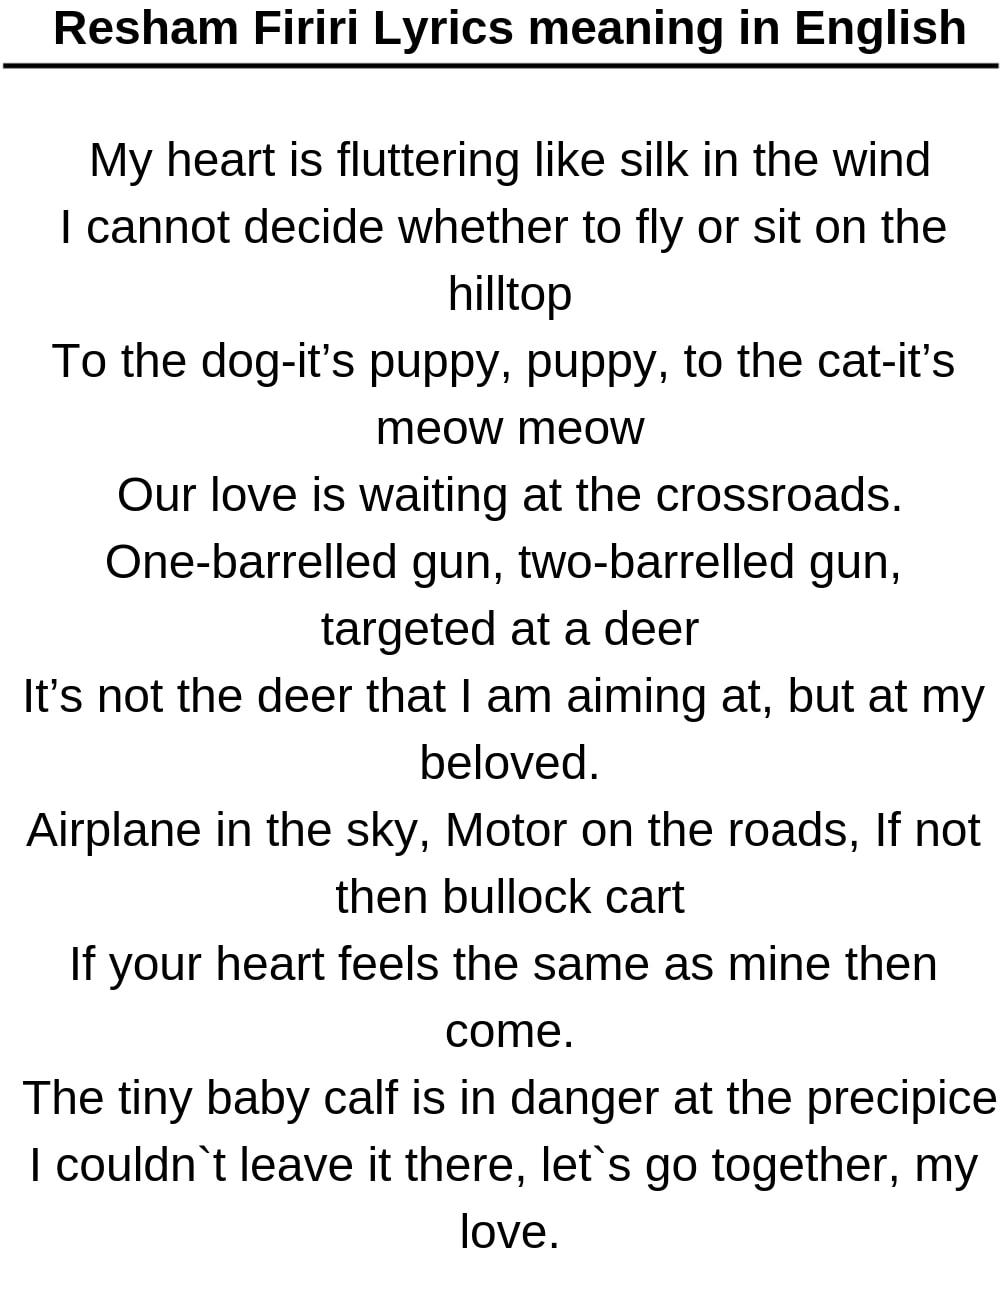 Resham Firiri Lyrics meaning in English